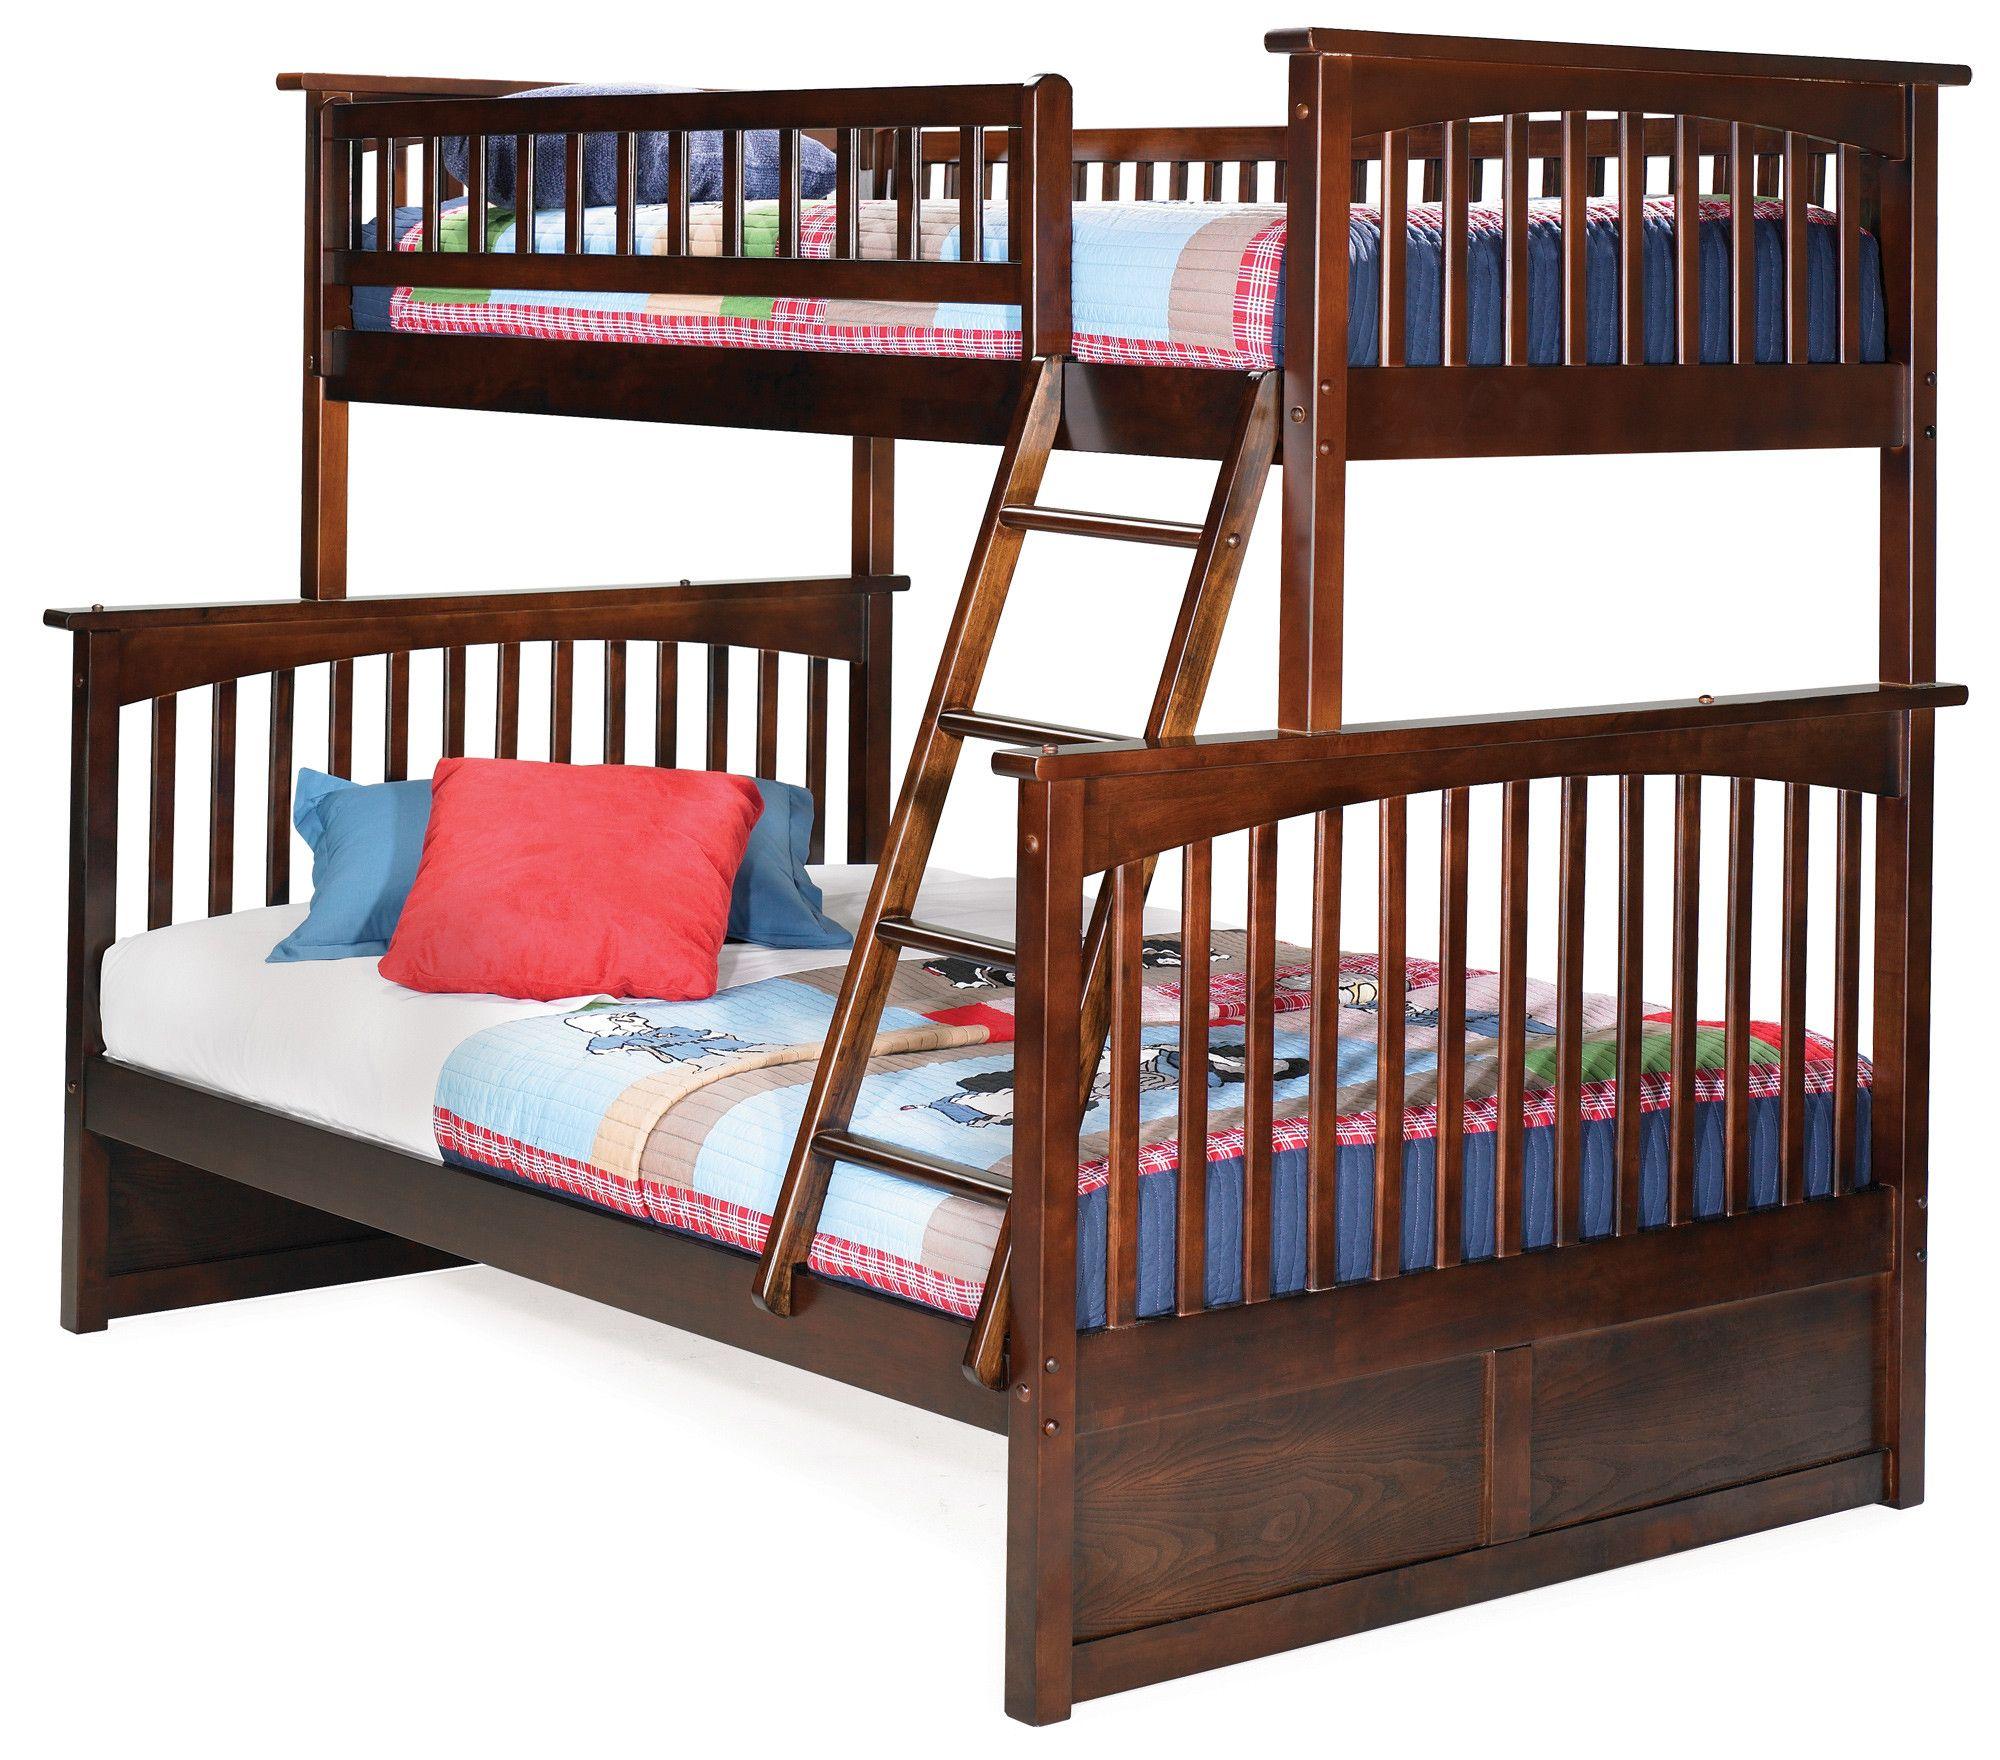 Atlantic Furniture Columbia Bunk Bed Bunk Beds With Stairs Atlantic Furniture Bunk Beds